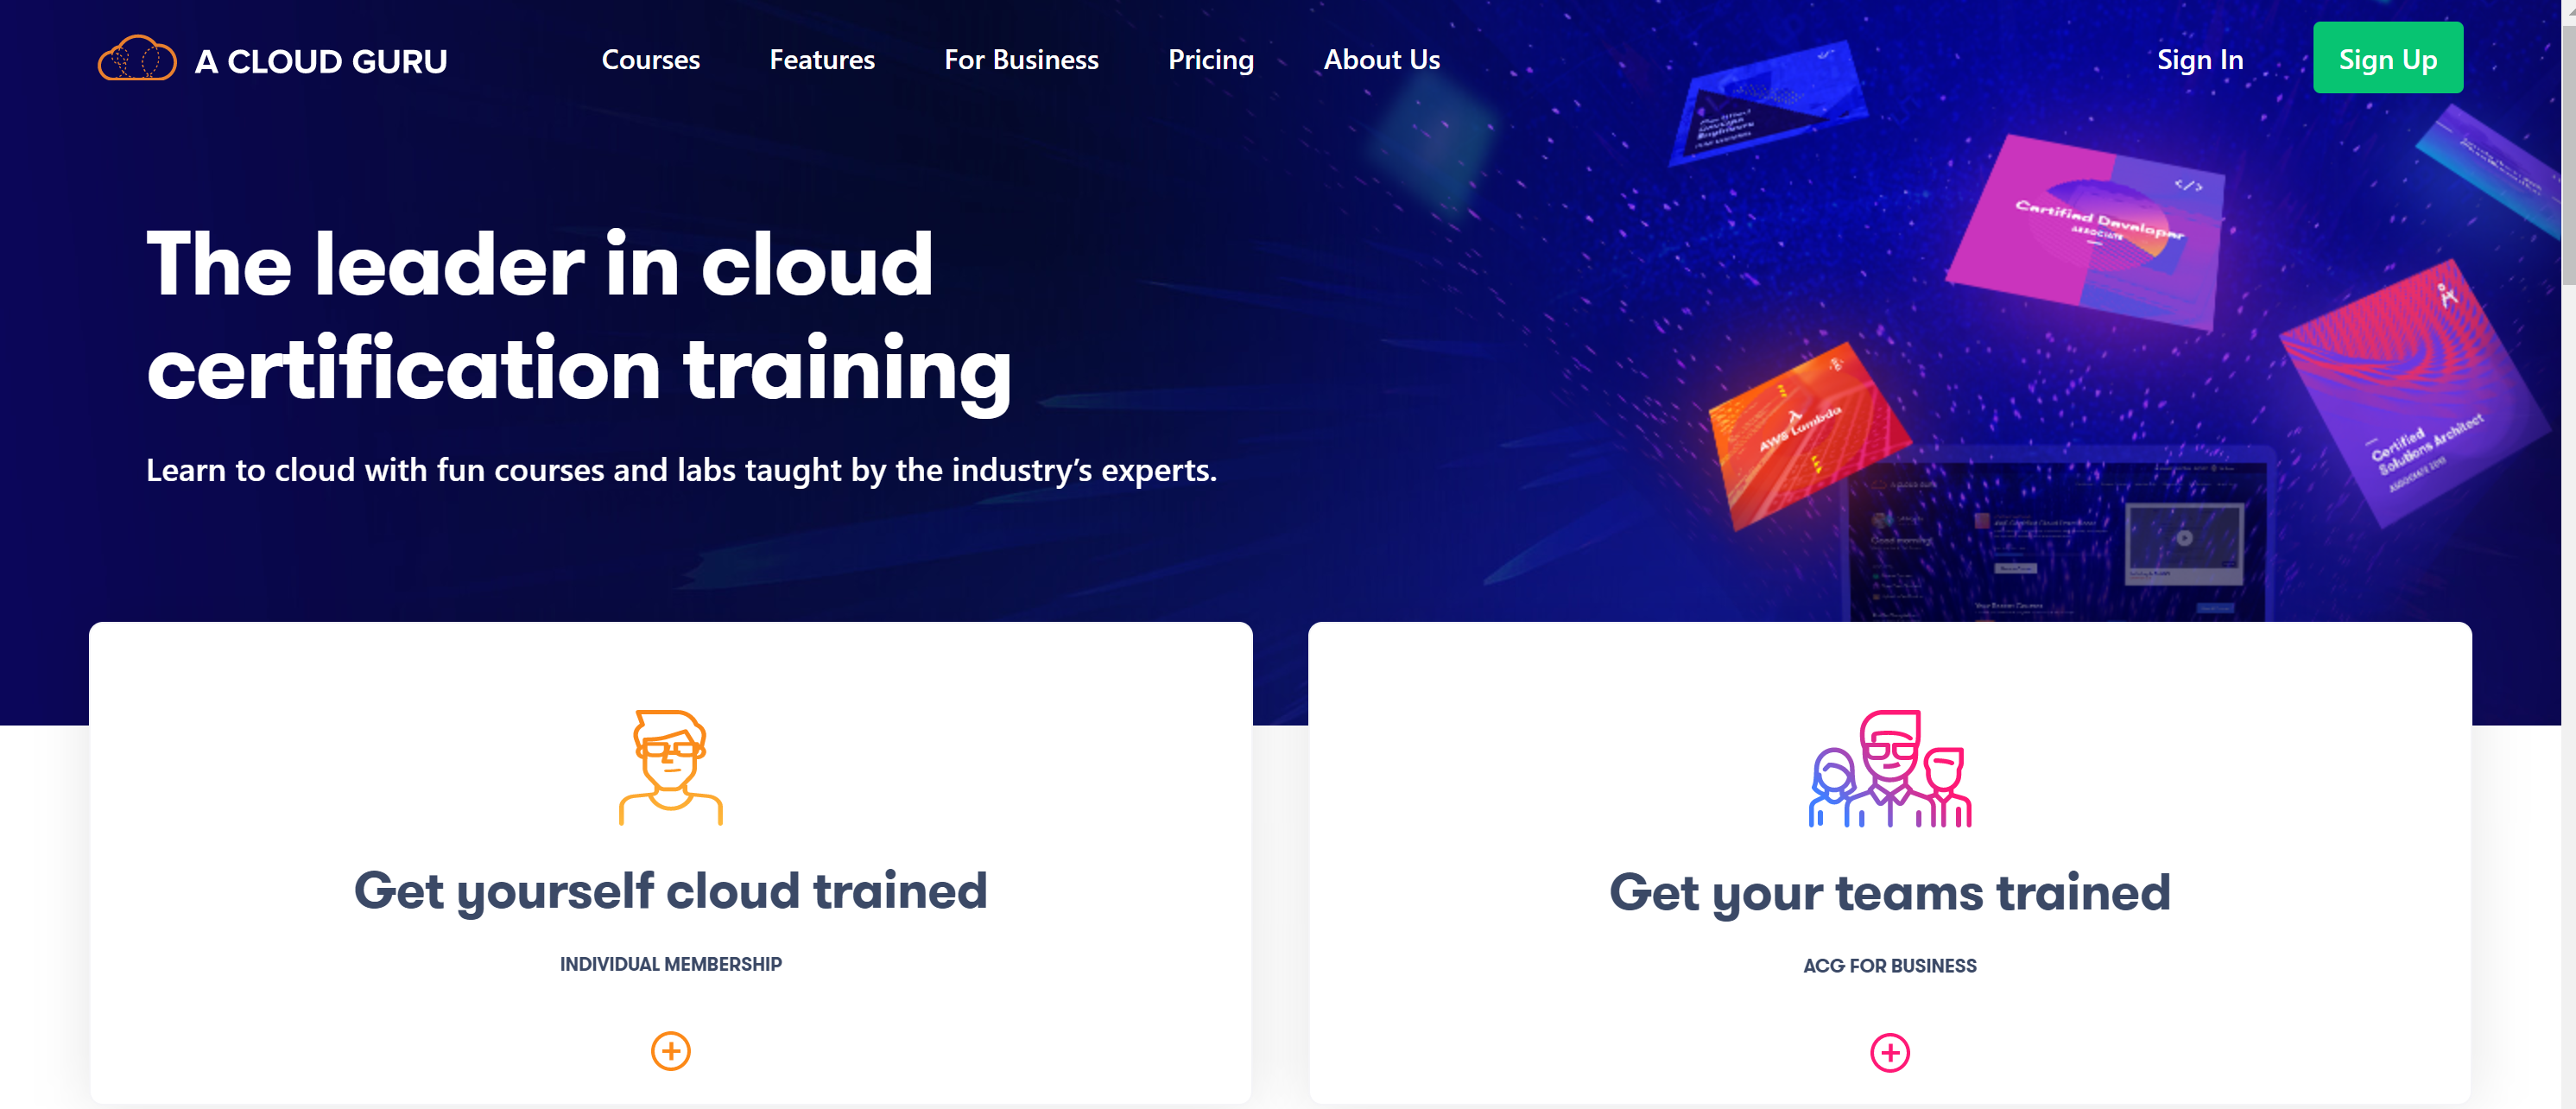 A Cloud guru AWS Lambda courses